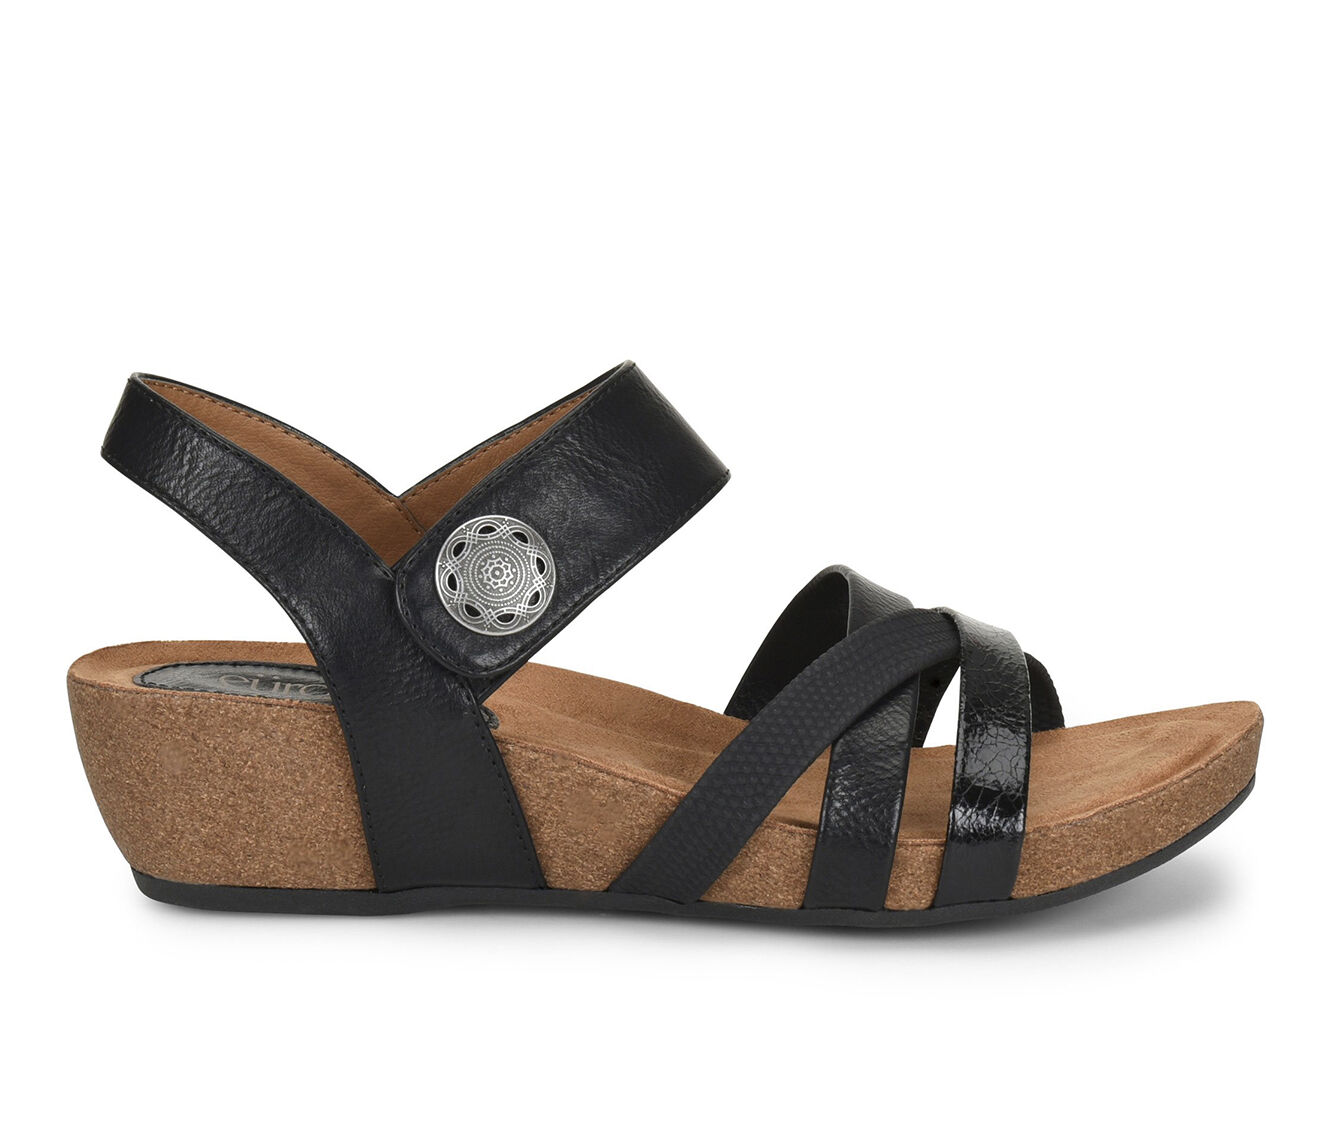 purchase cheap Women's EuroSoft Renae Strappy Wedge Sandals Black